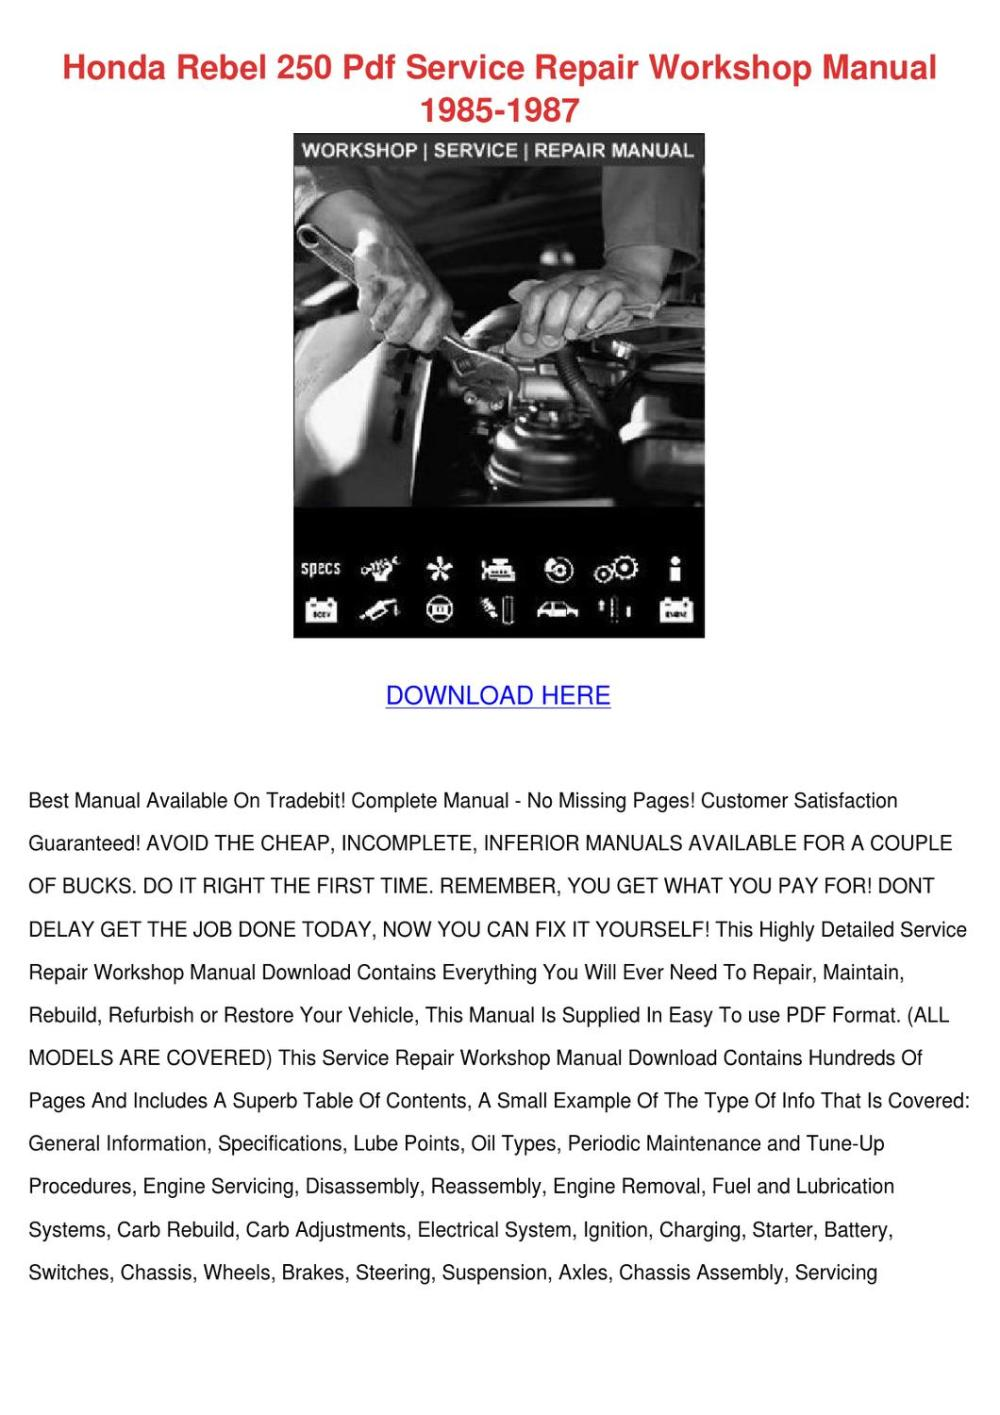 medium resolution of honda rebel 250 pdf service repair workshop m by cherelle mcglathery issuu